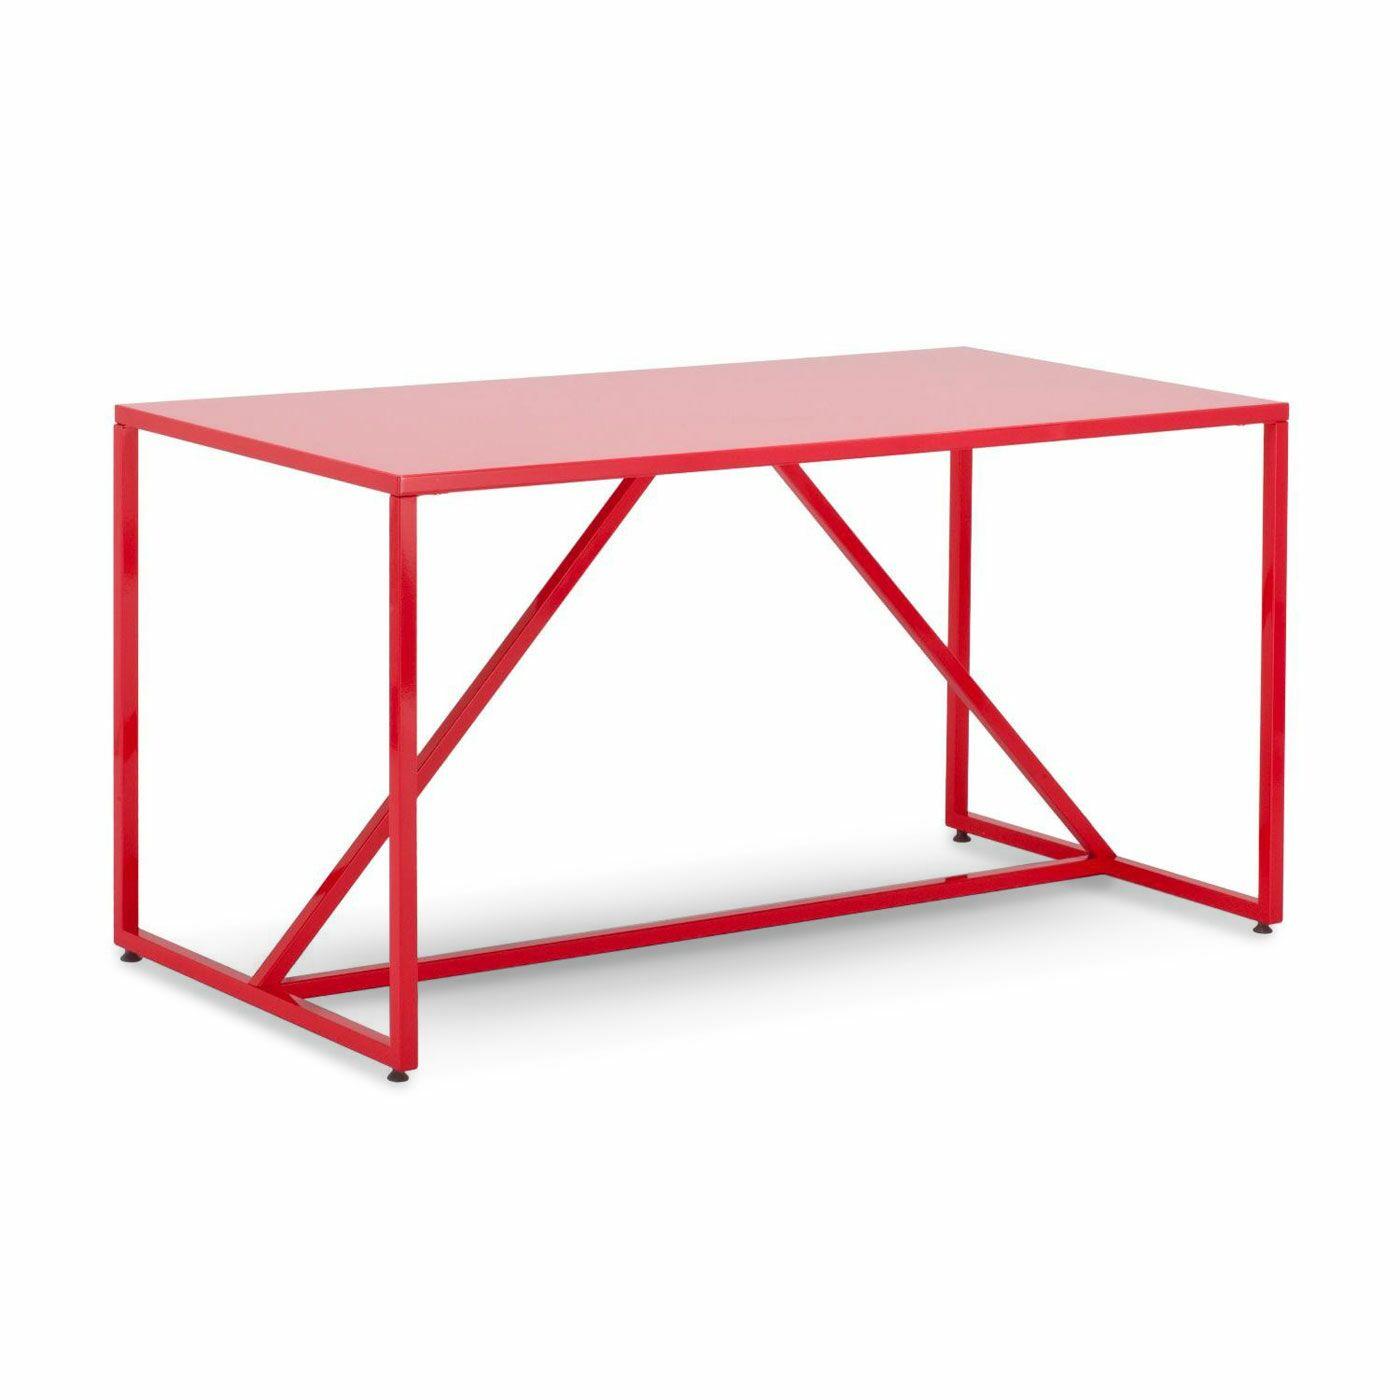 Strut Table Table Color: Watermelon, Table Size: Medium - 56